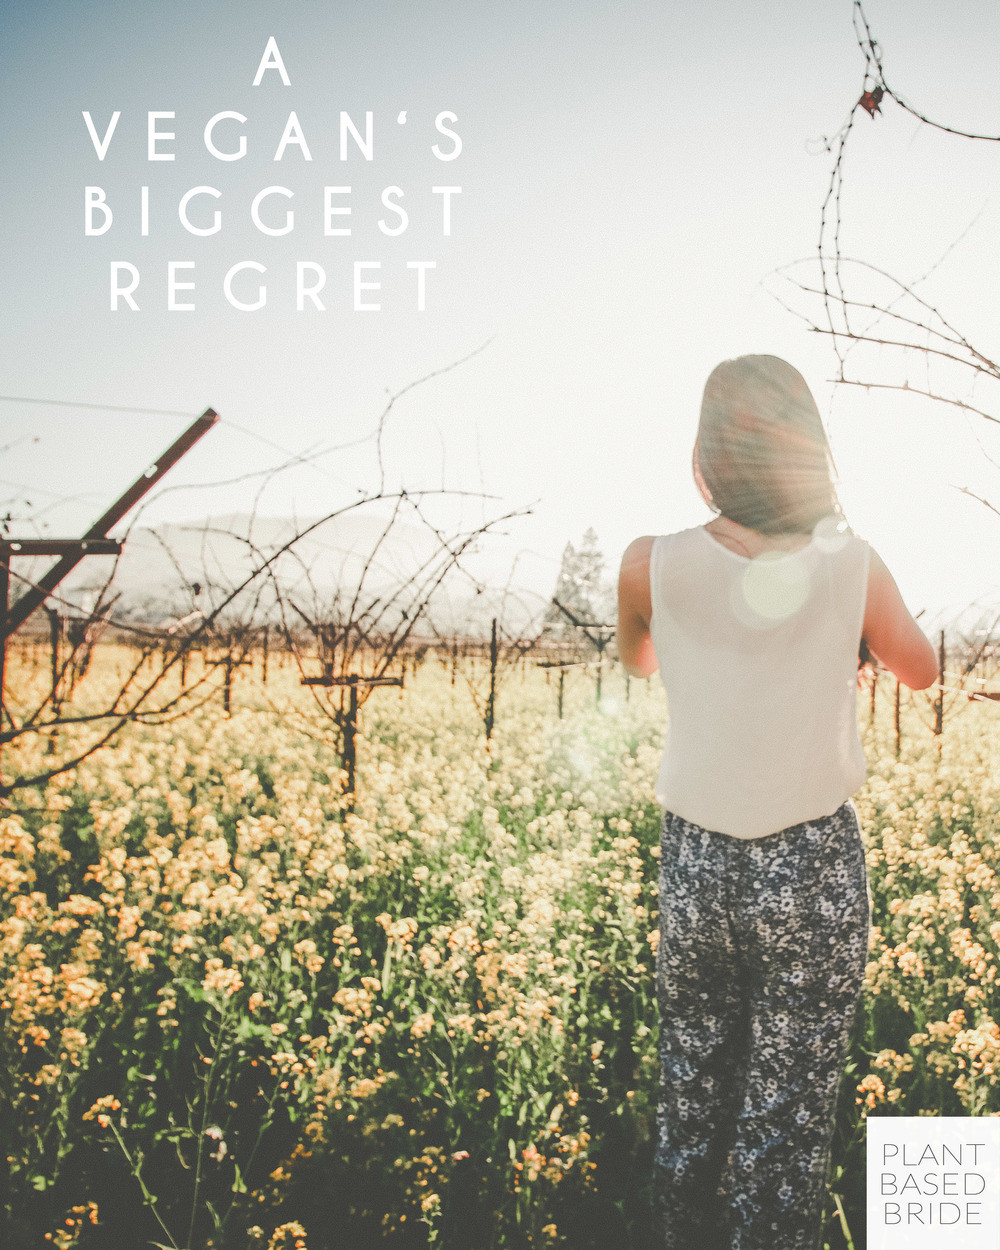 My biggest regret as a vegan. // Plant Based Bride